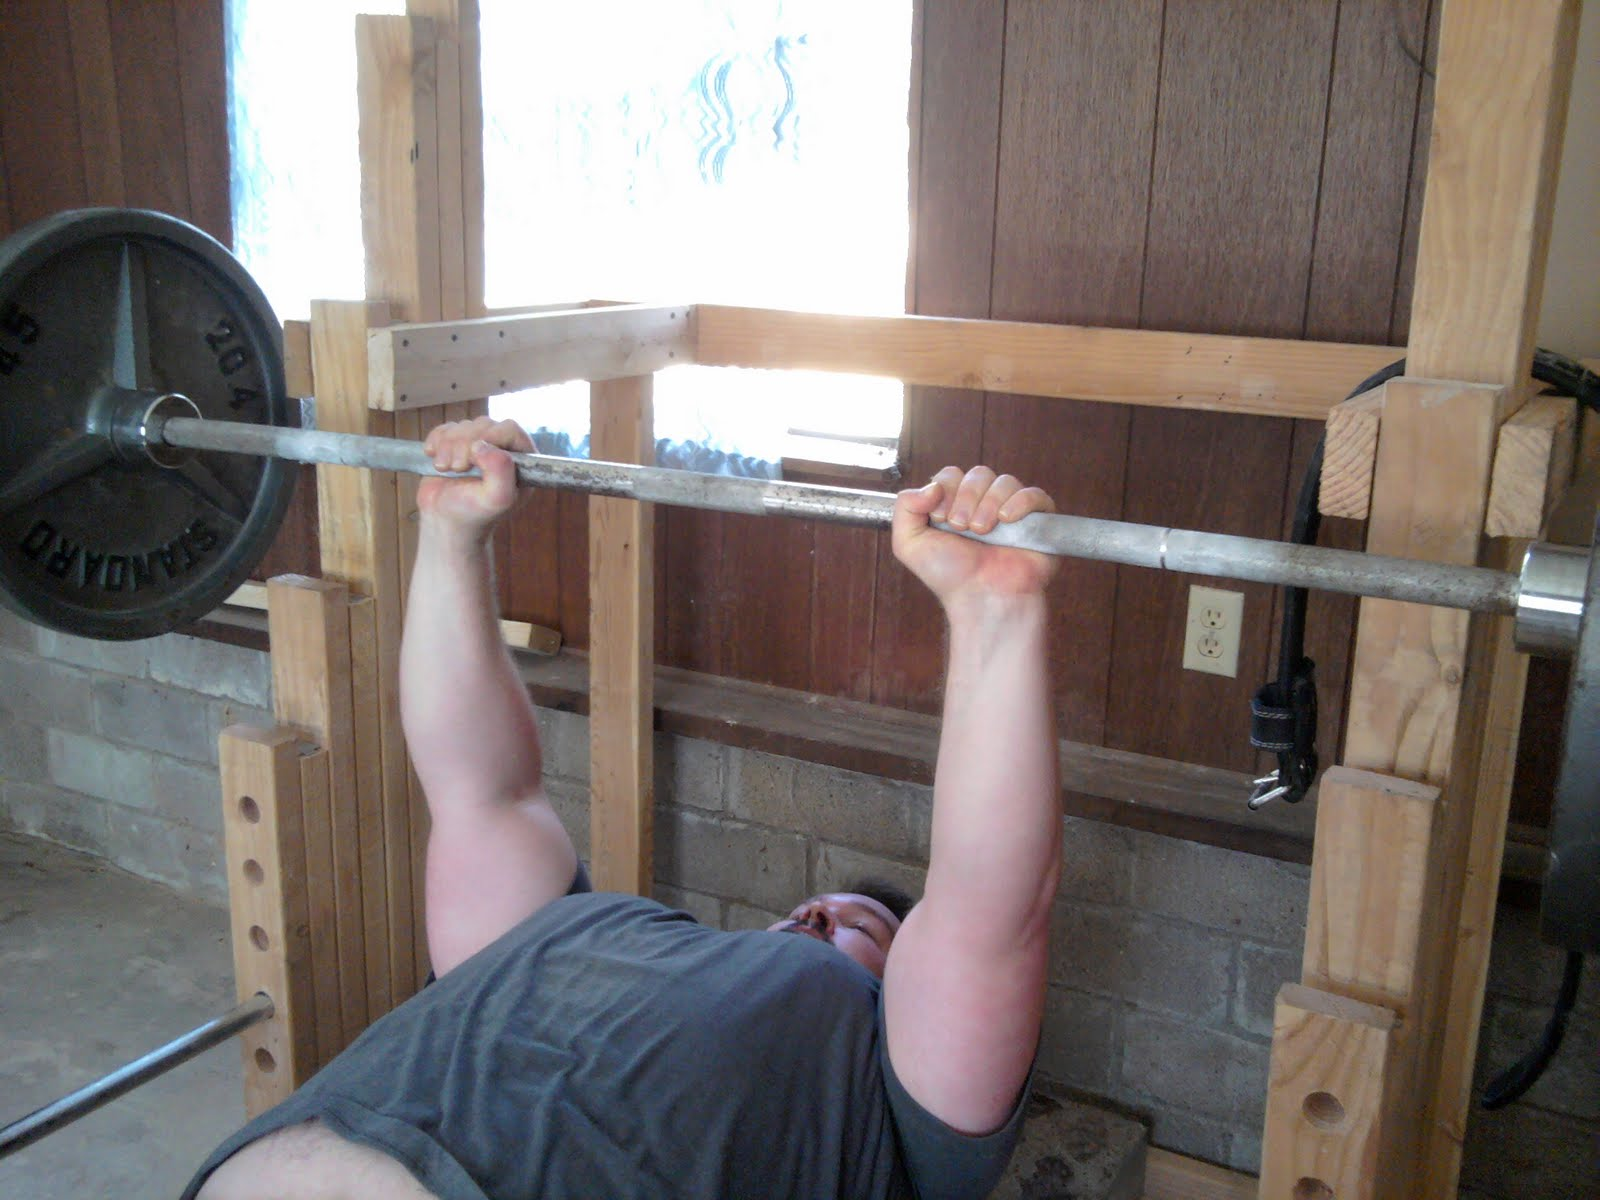 towo access diy workout bench plans